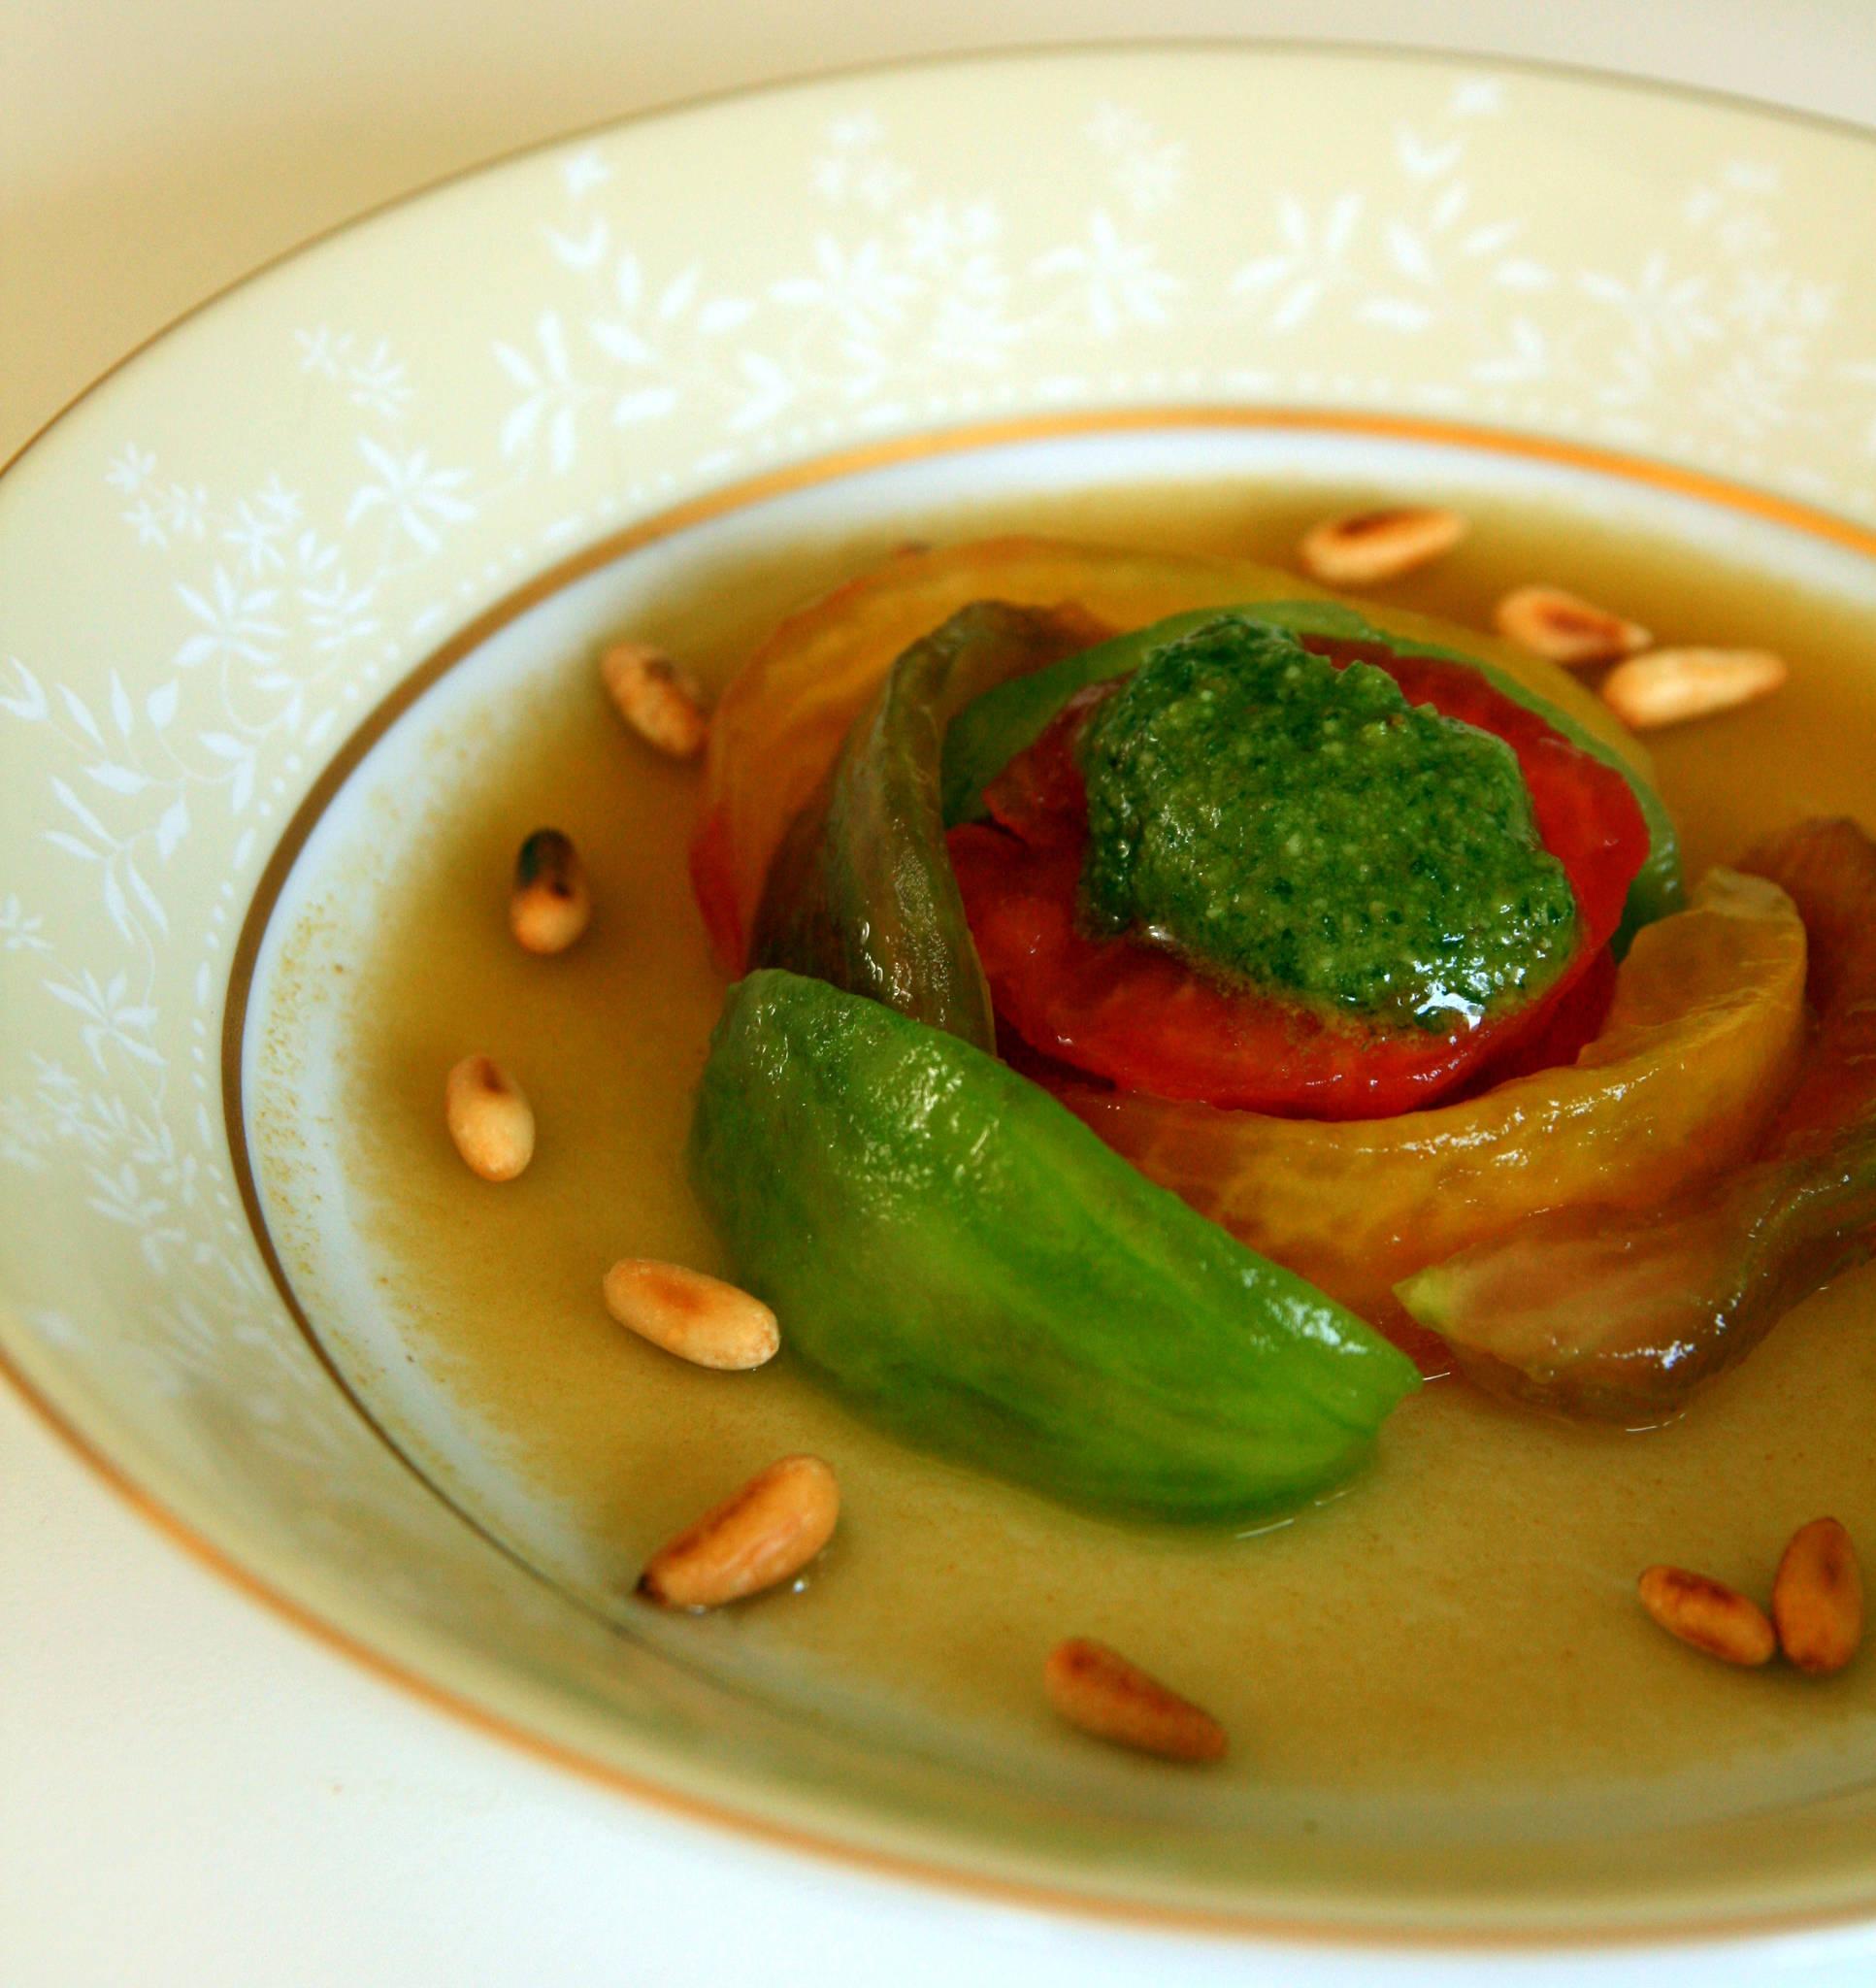 Salade de tomates multicolores, gelée d'eau de tomates, pesto basilic